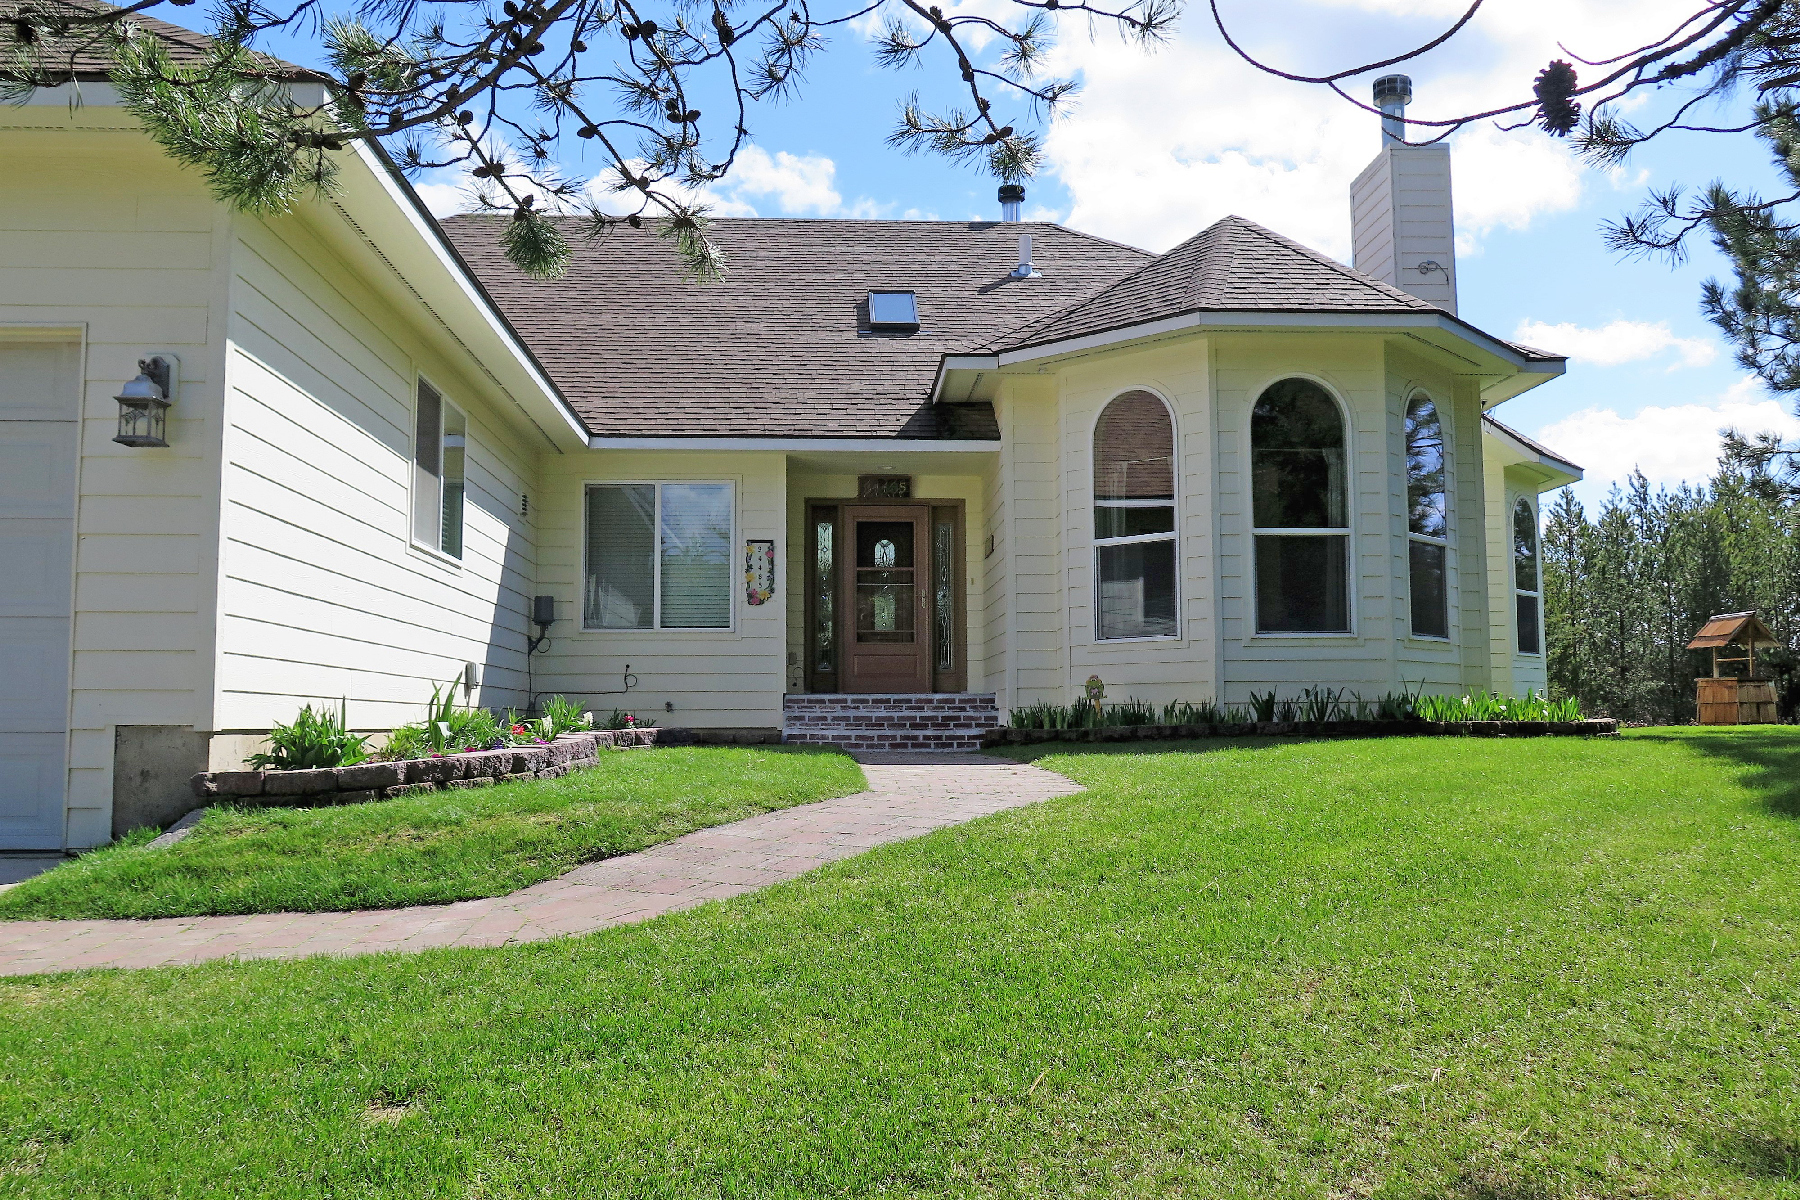 Vivienda unifamiliar por un Venta en Gorgeous Home On 10.8 Acres 34485 N Kelso Dr Spirit Lake, Idaho, 83869 Estados Unidos